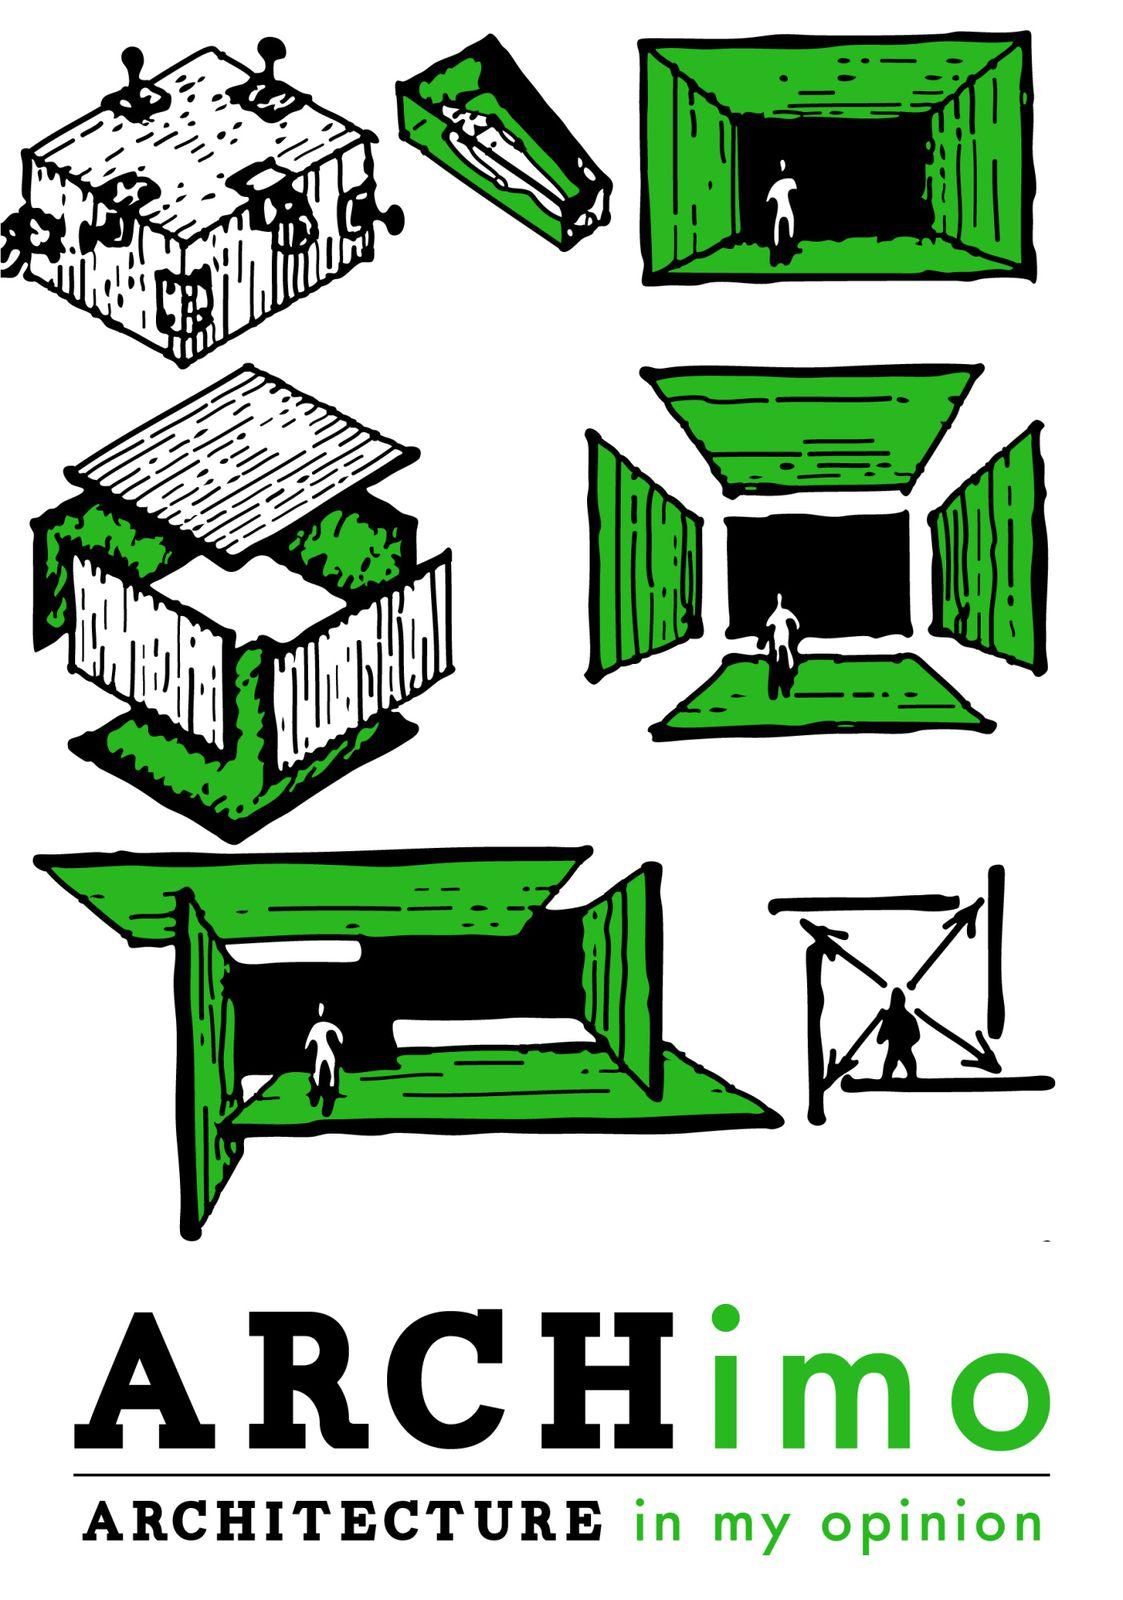 Architettura archimo for Bruno zevi saper vedere l architettura